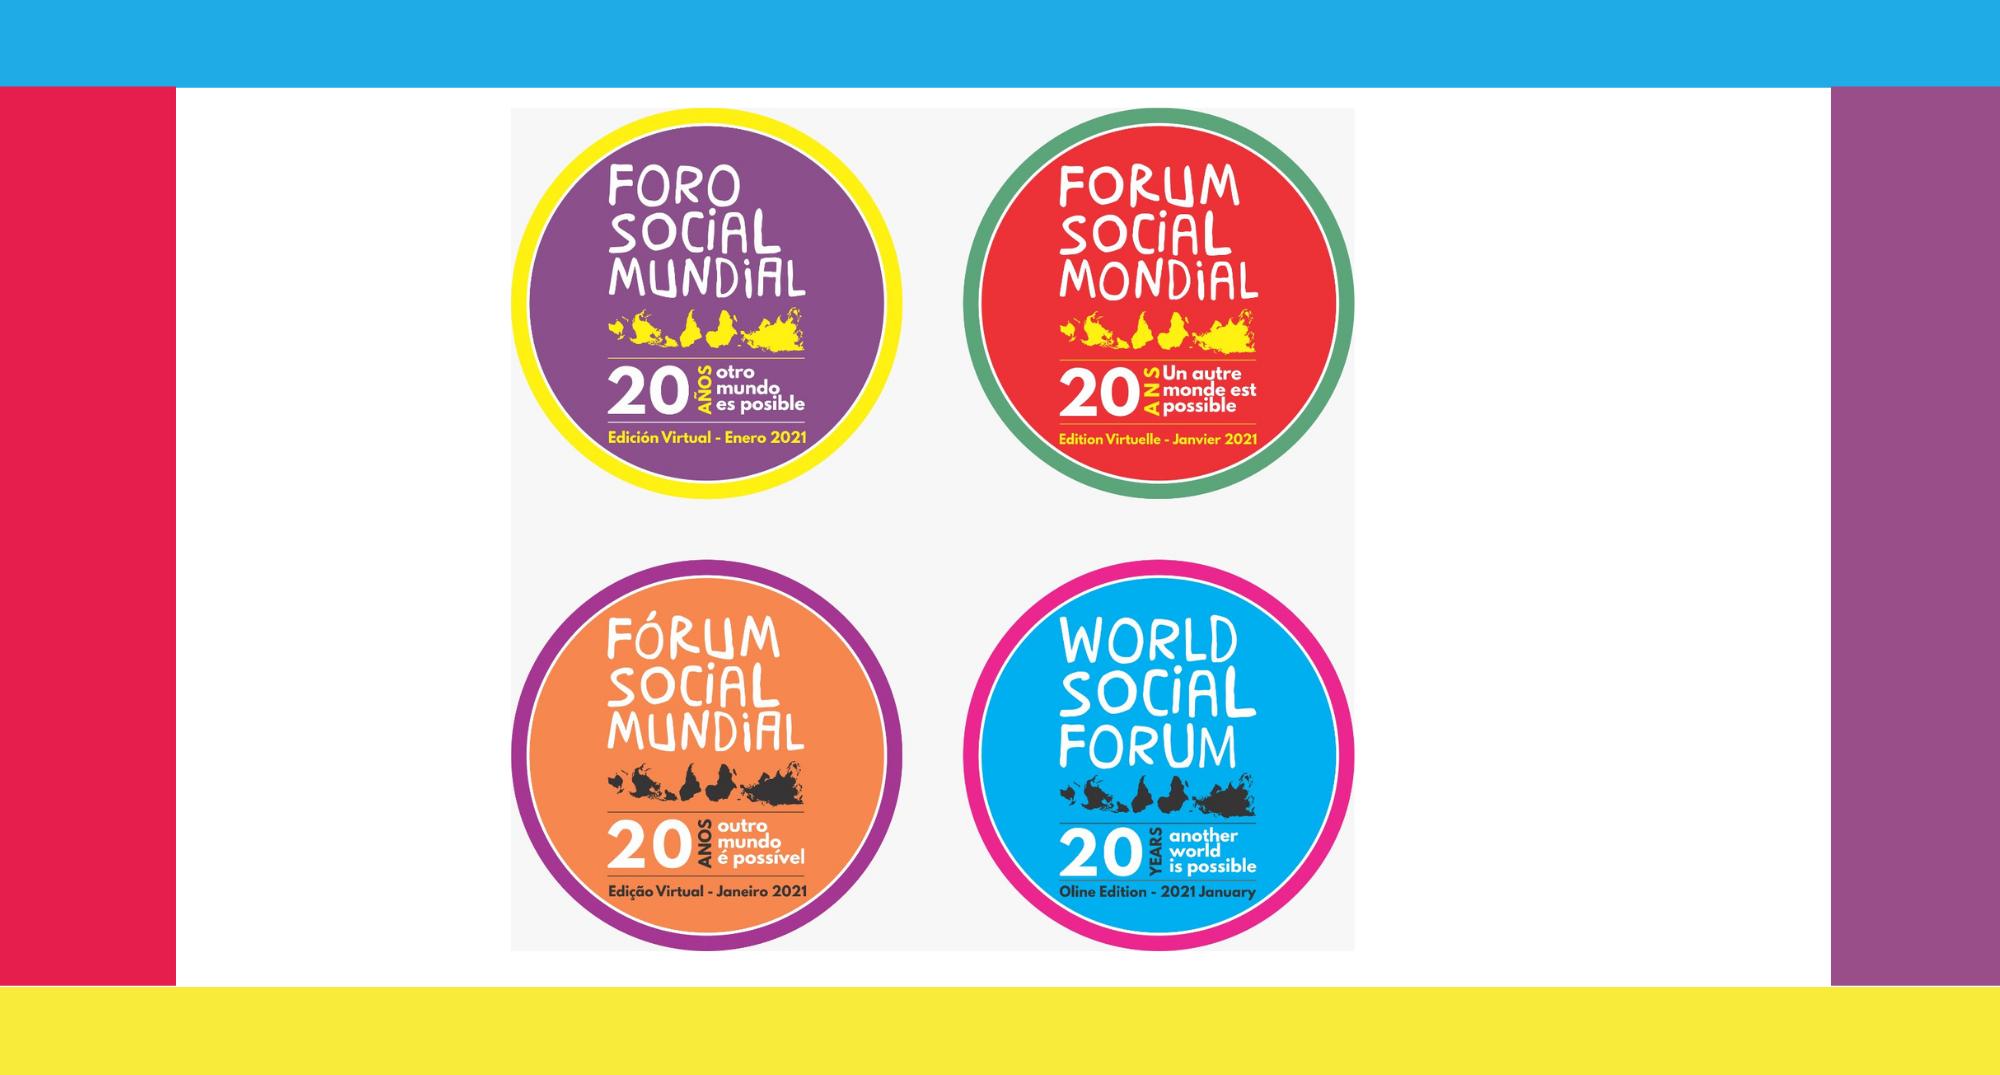 Vamos construir junt@s o próximo Fórum Social Mundial